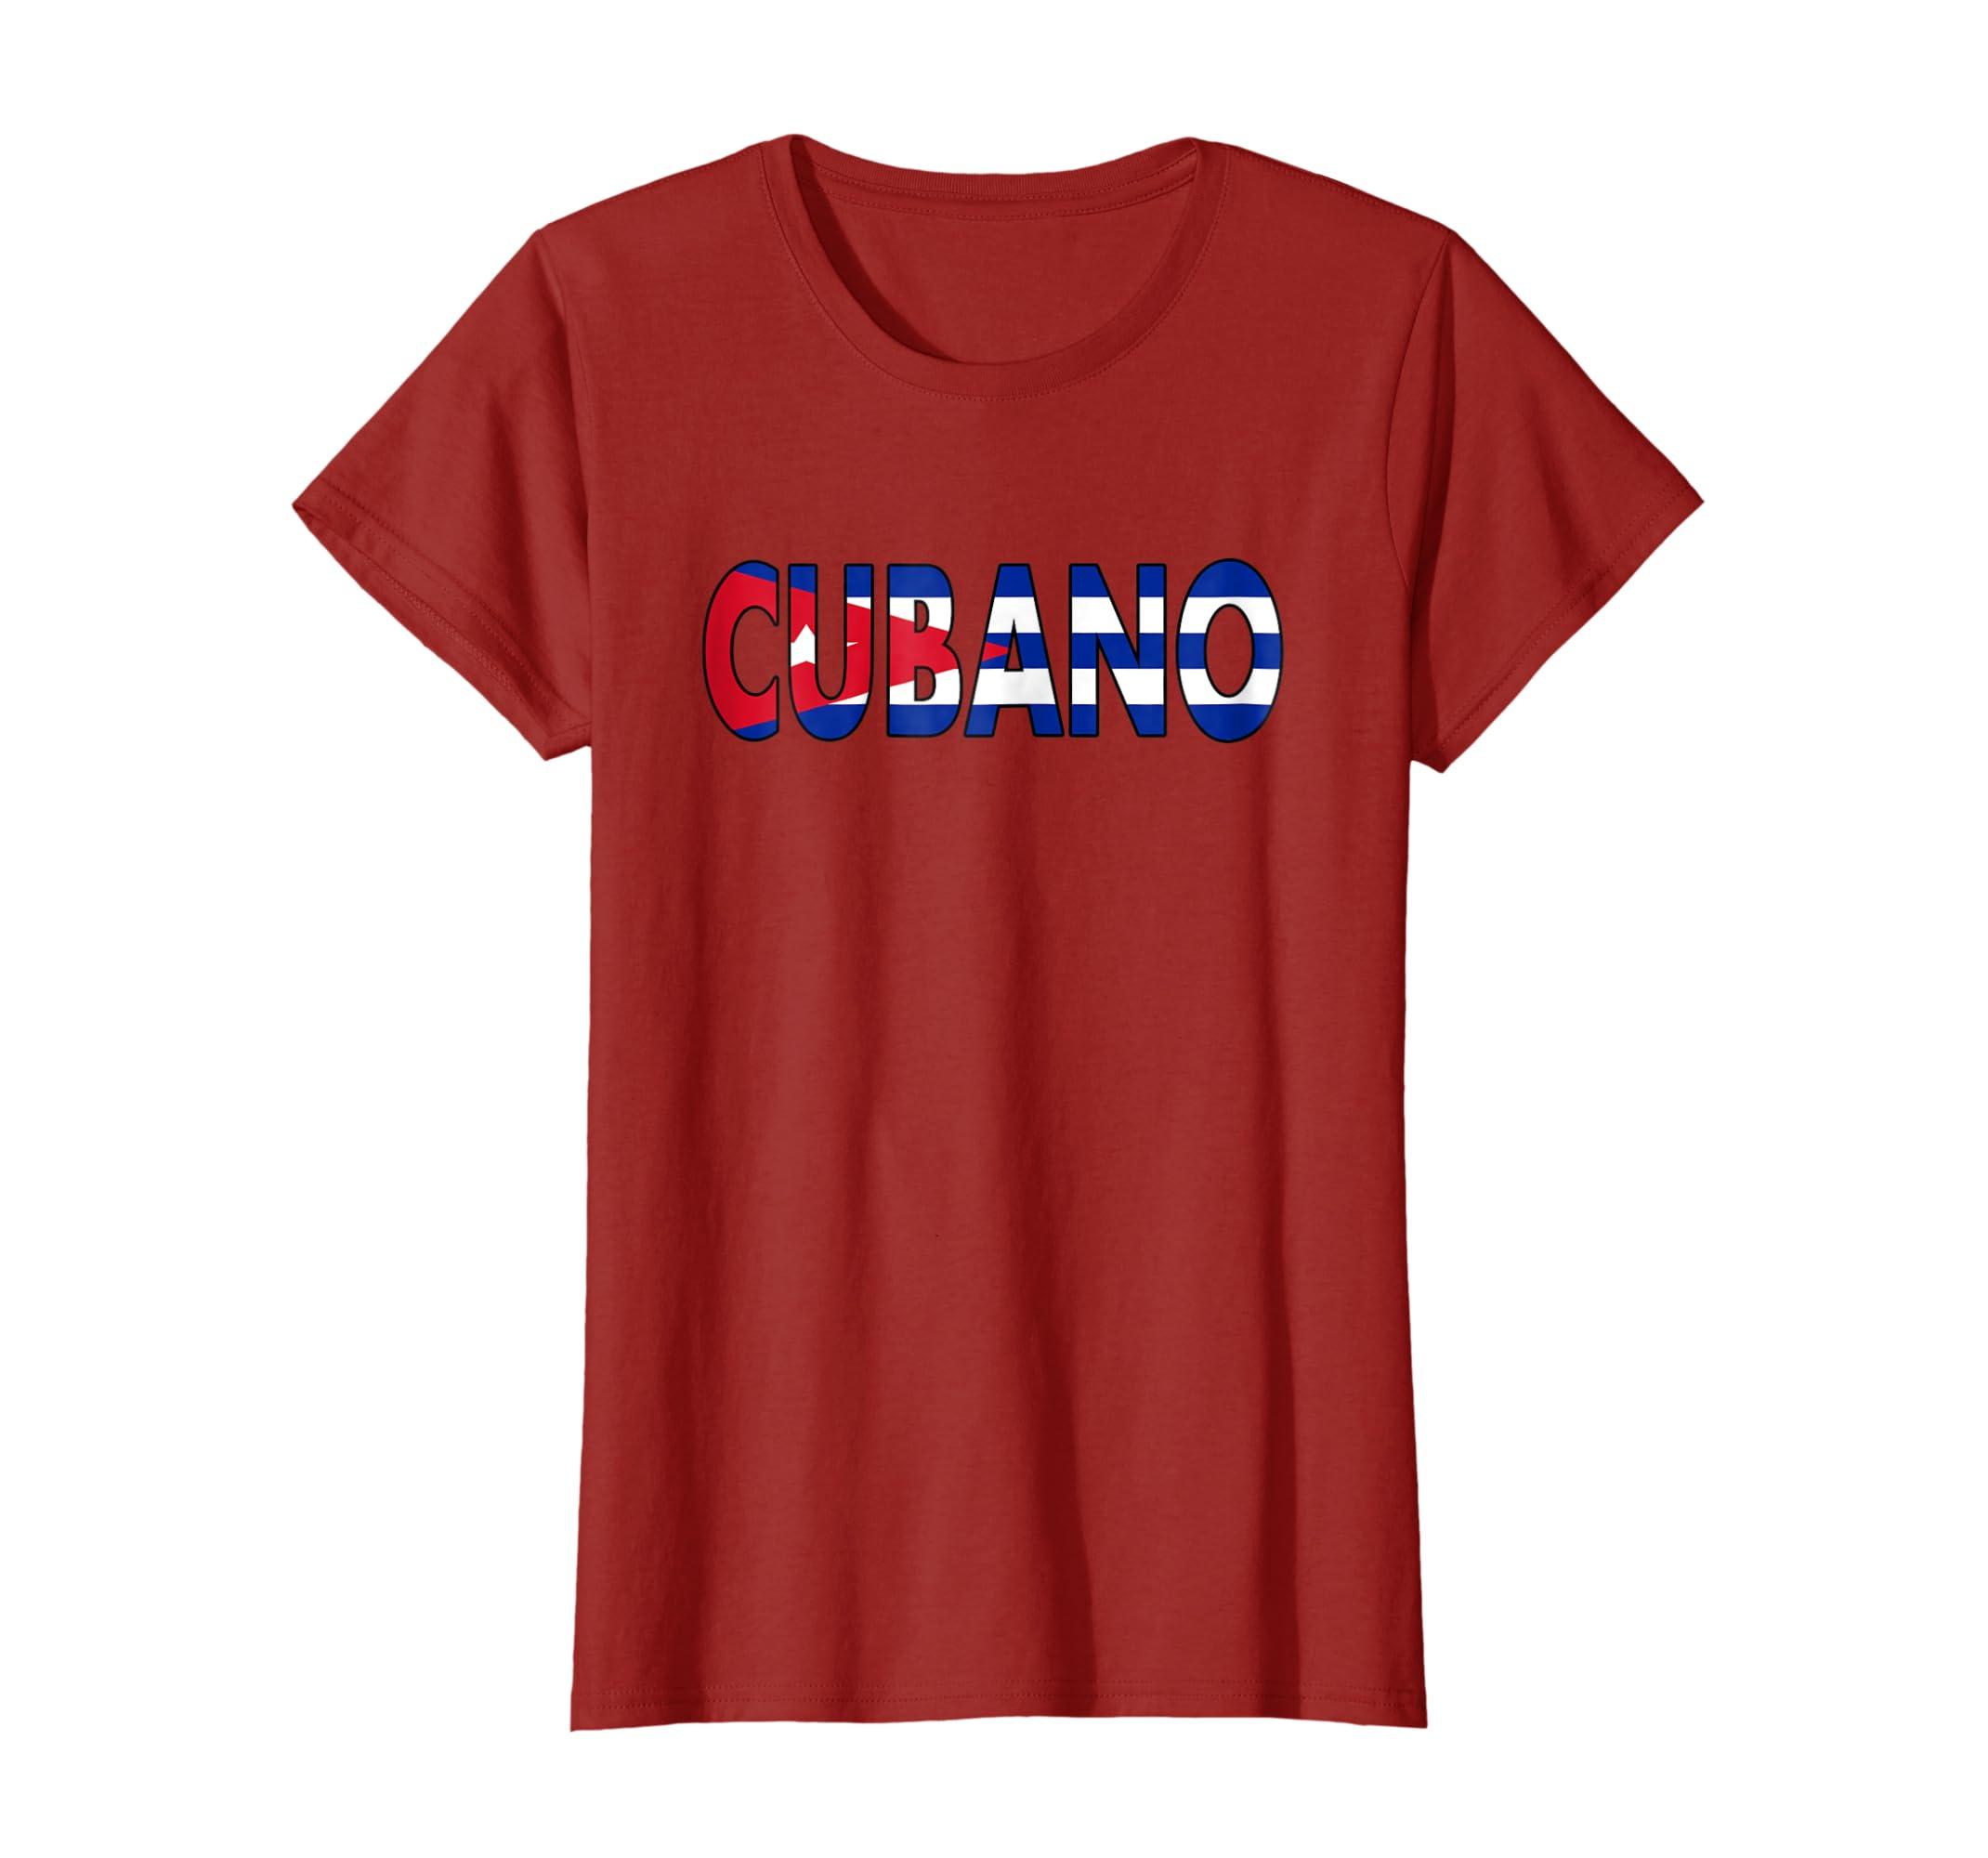 Amazon.com: Camiseta Con Bandera Cubana Cubano Shirt With The Cuban Flag: Clothing